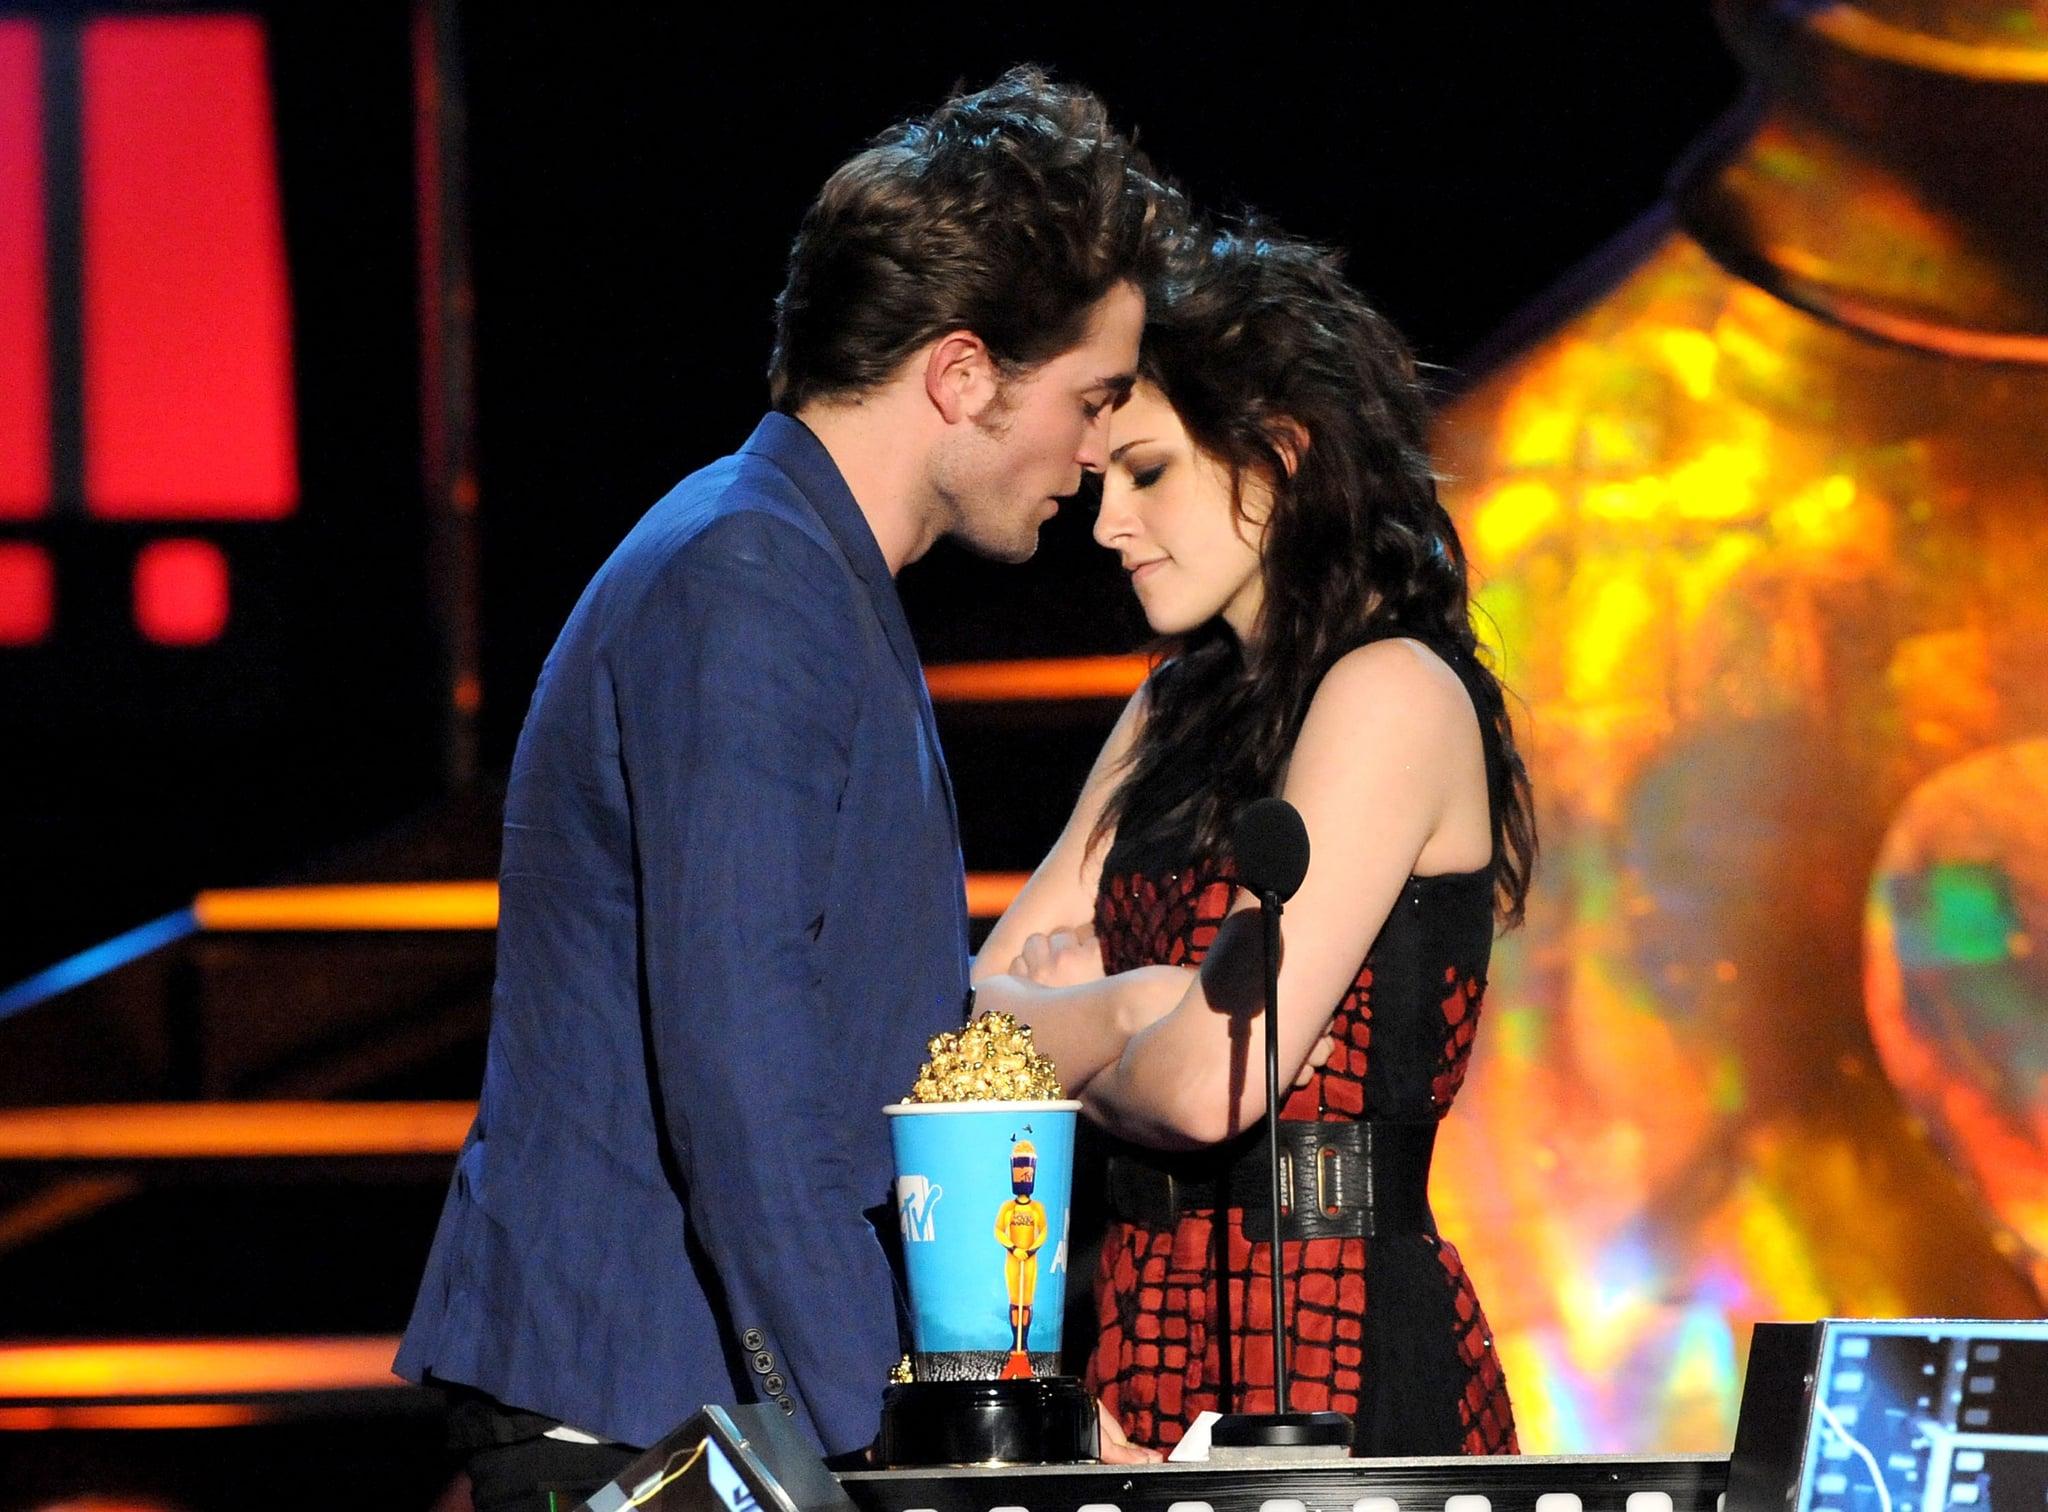 Robert Pattinson ja Kristen Stewart dating 2009